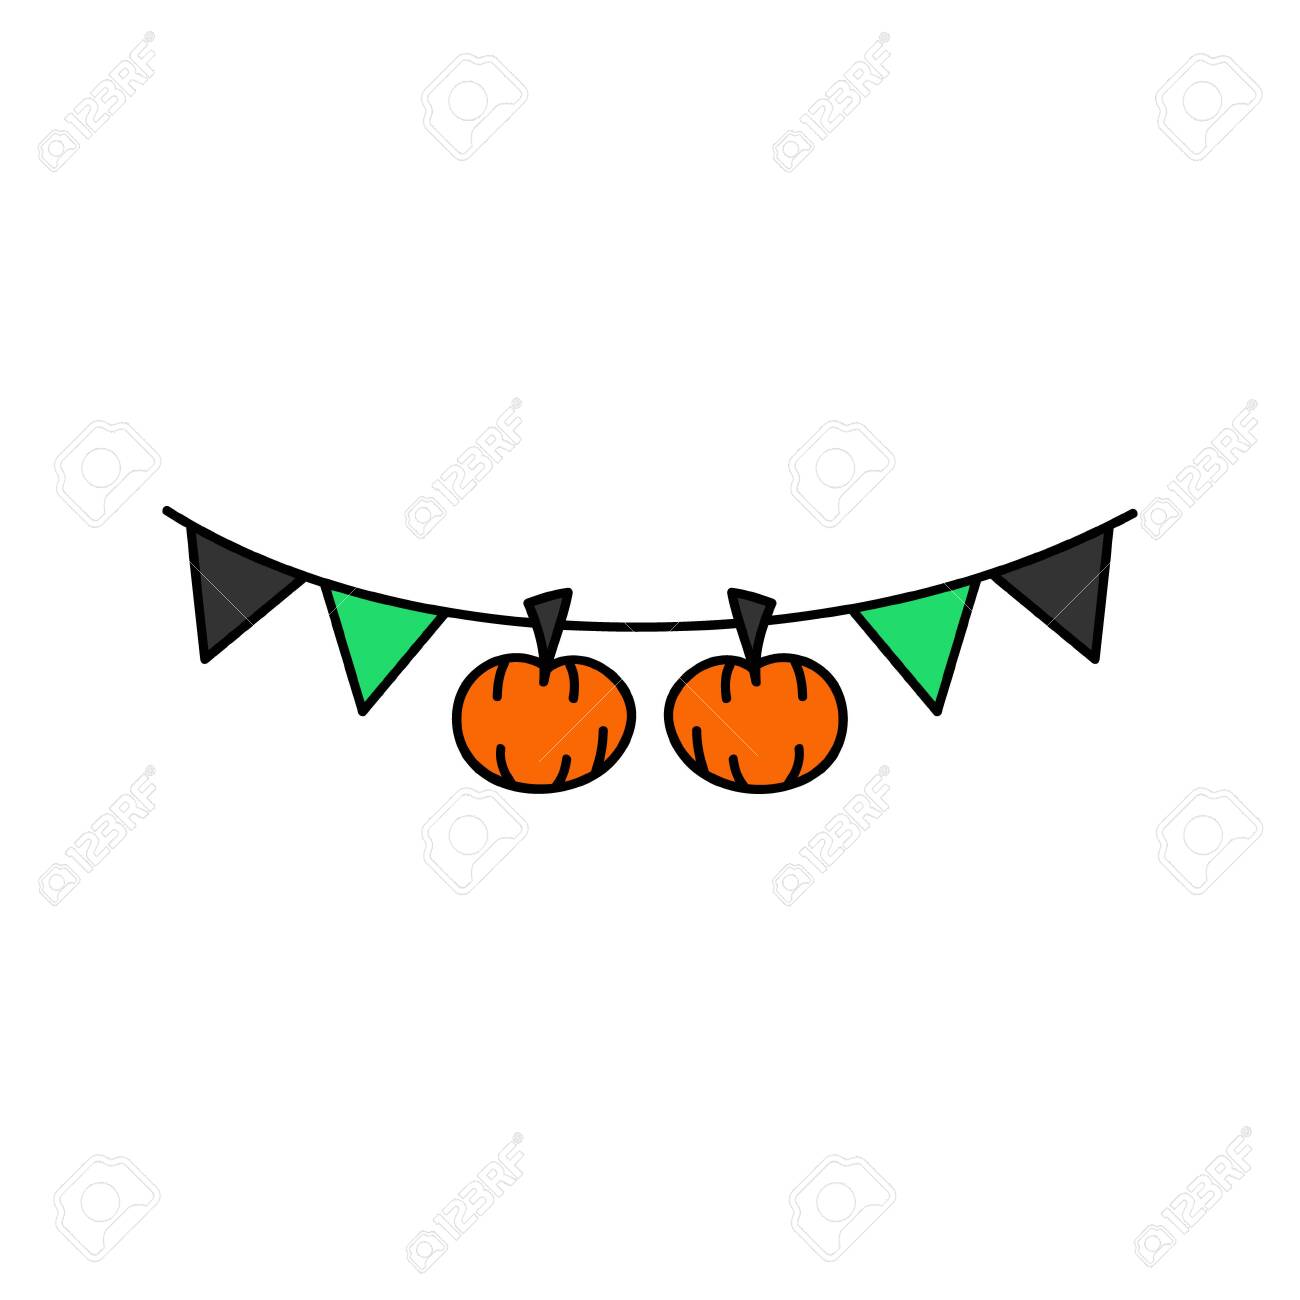 Cute Hand Drawn Halloween Garland Vector Illustration Holiday Royalty Free Cliparts Vectors And Stock Illustration Image 121528395